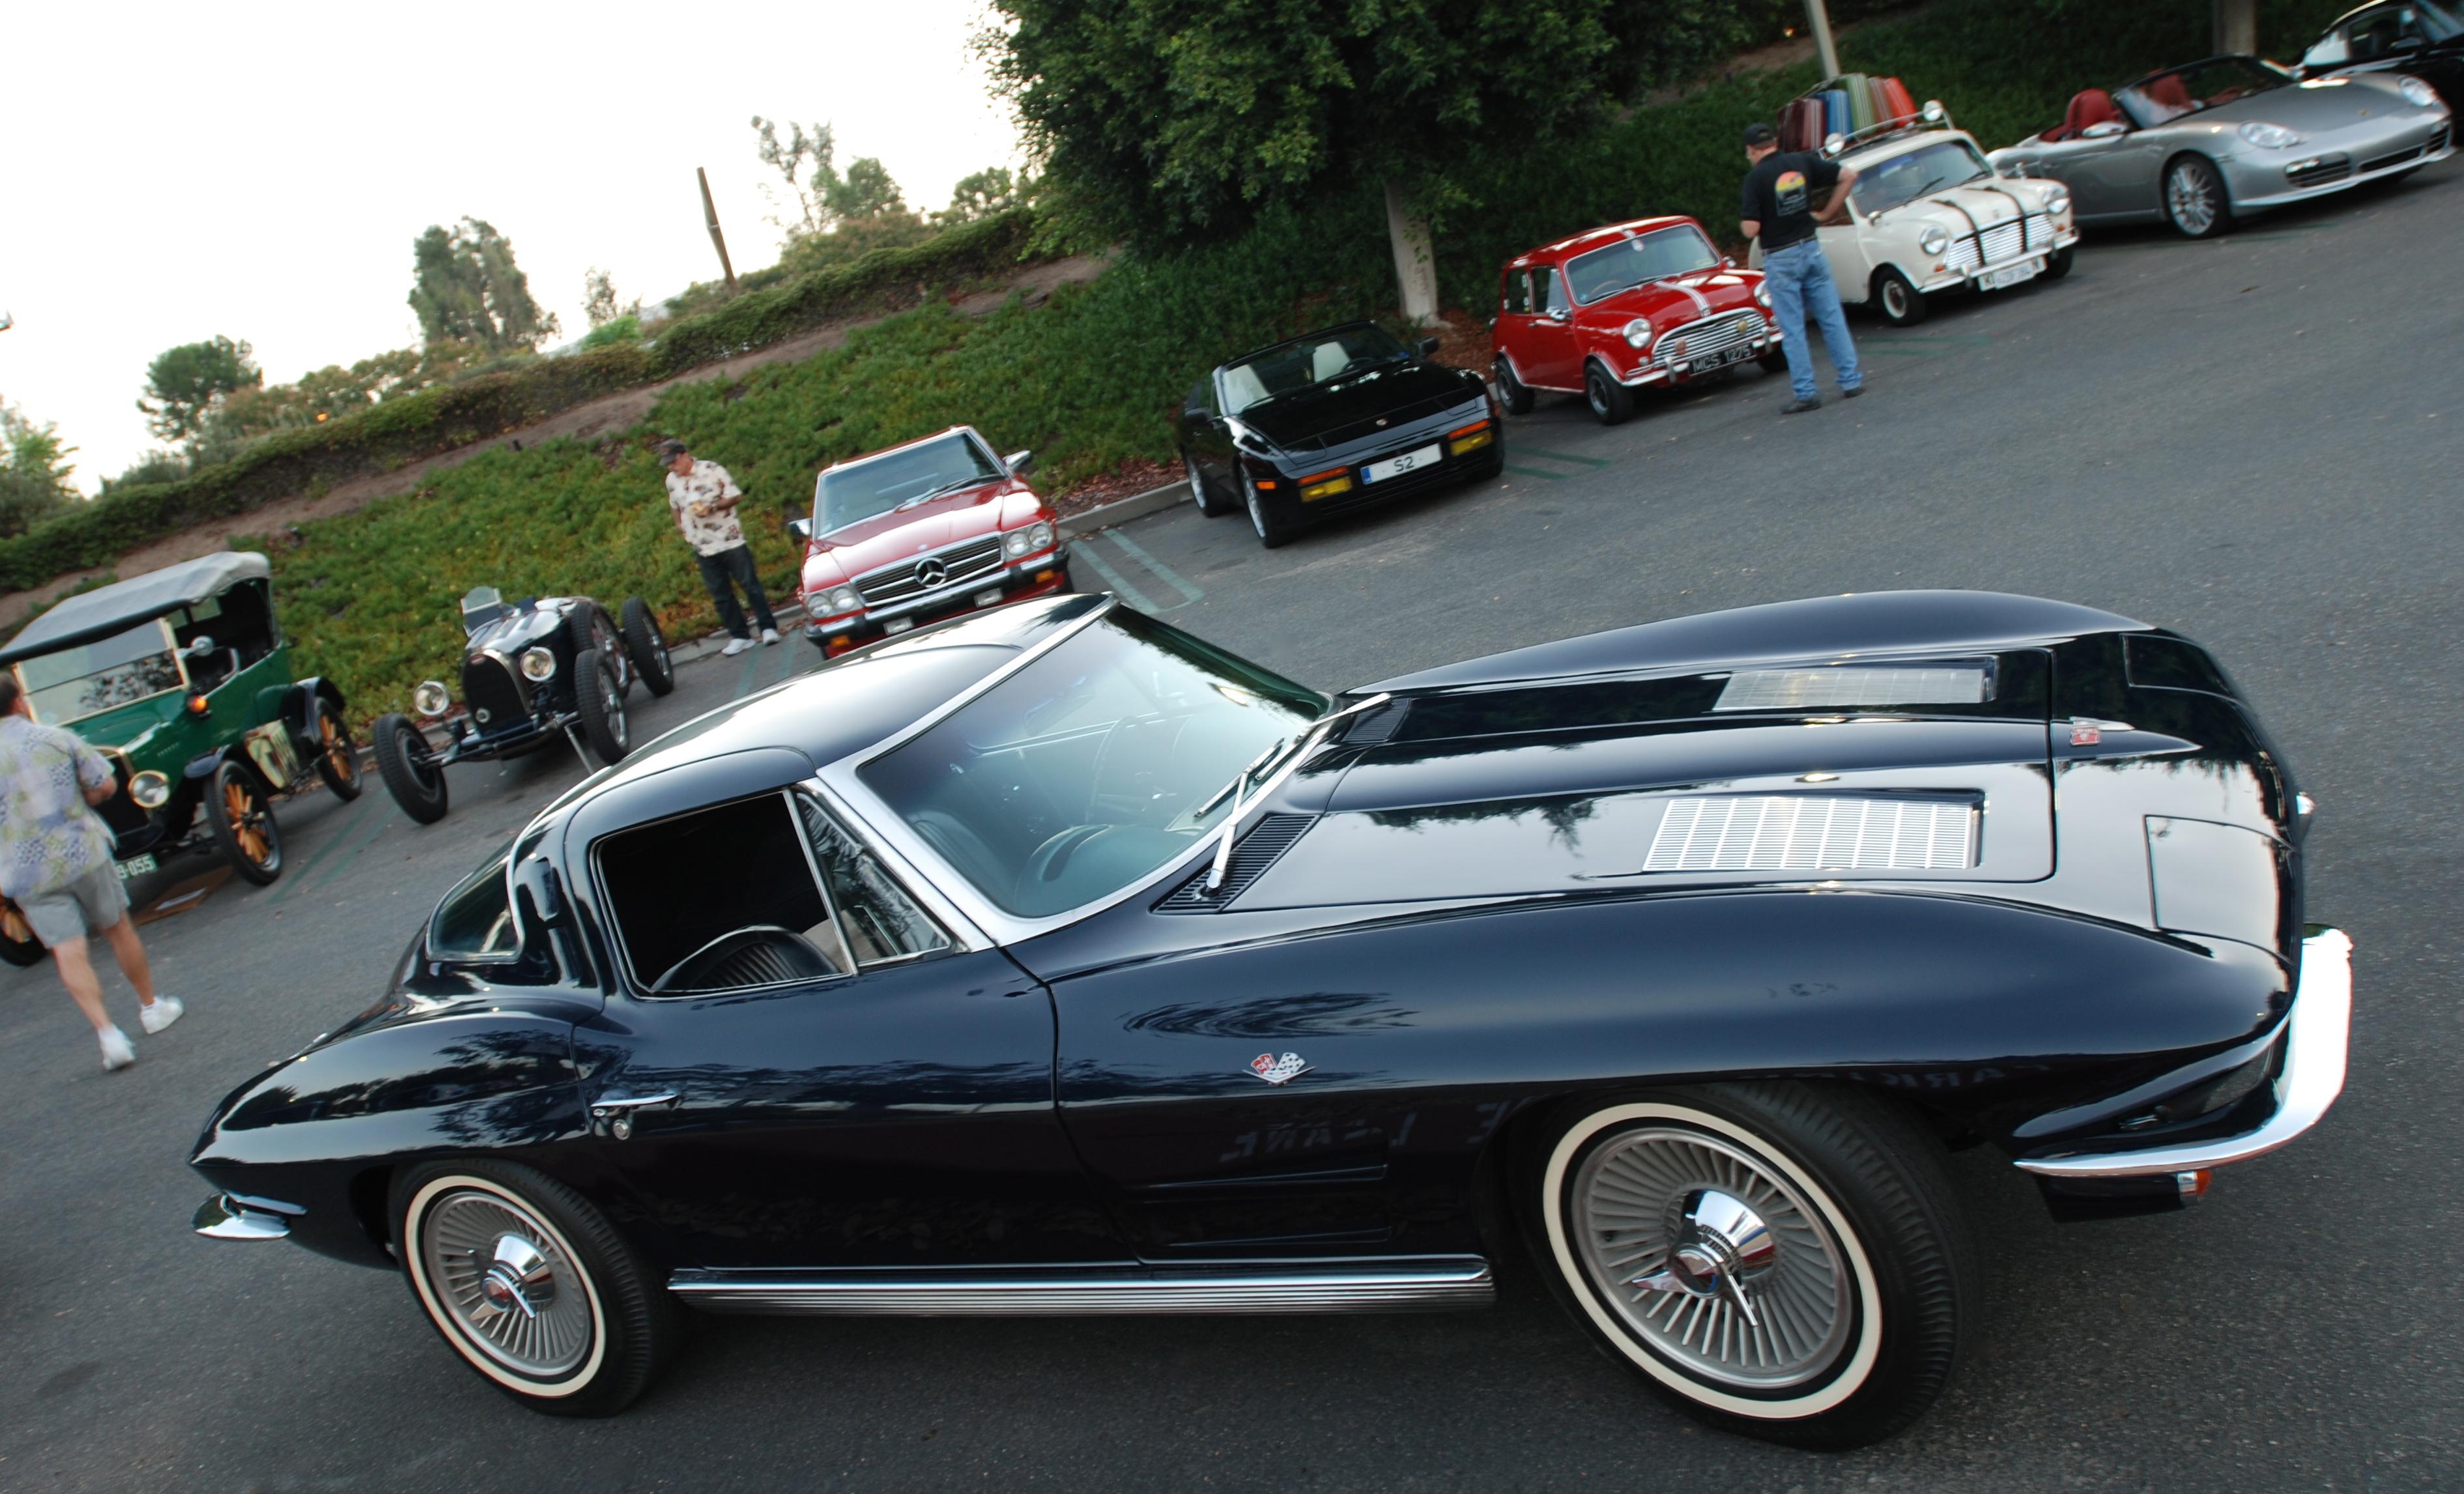 daytona blue 1963 corvette split window coupe 3 4 side view cars. Cars Review. Best American Auto & Cars Review